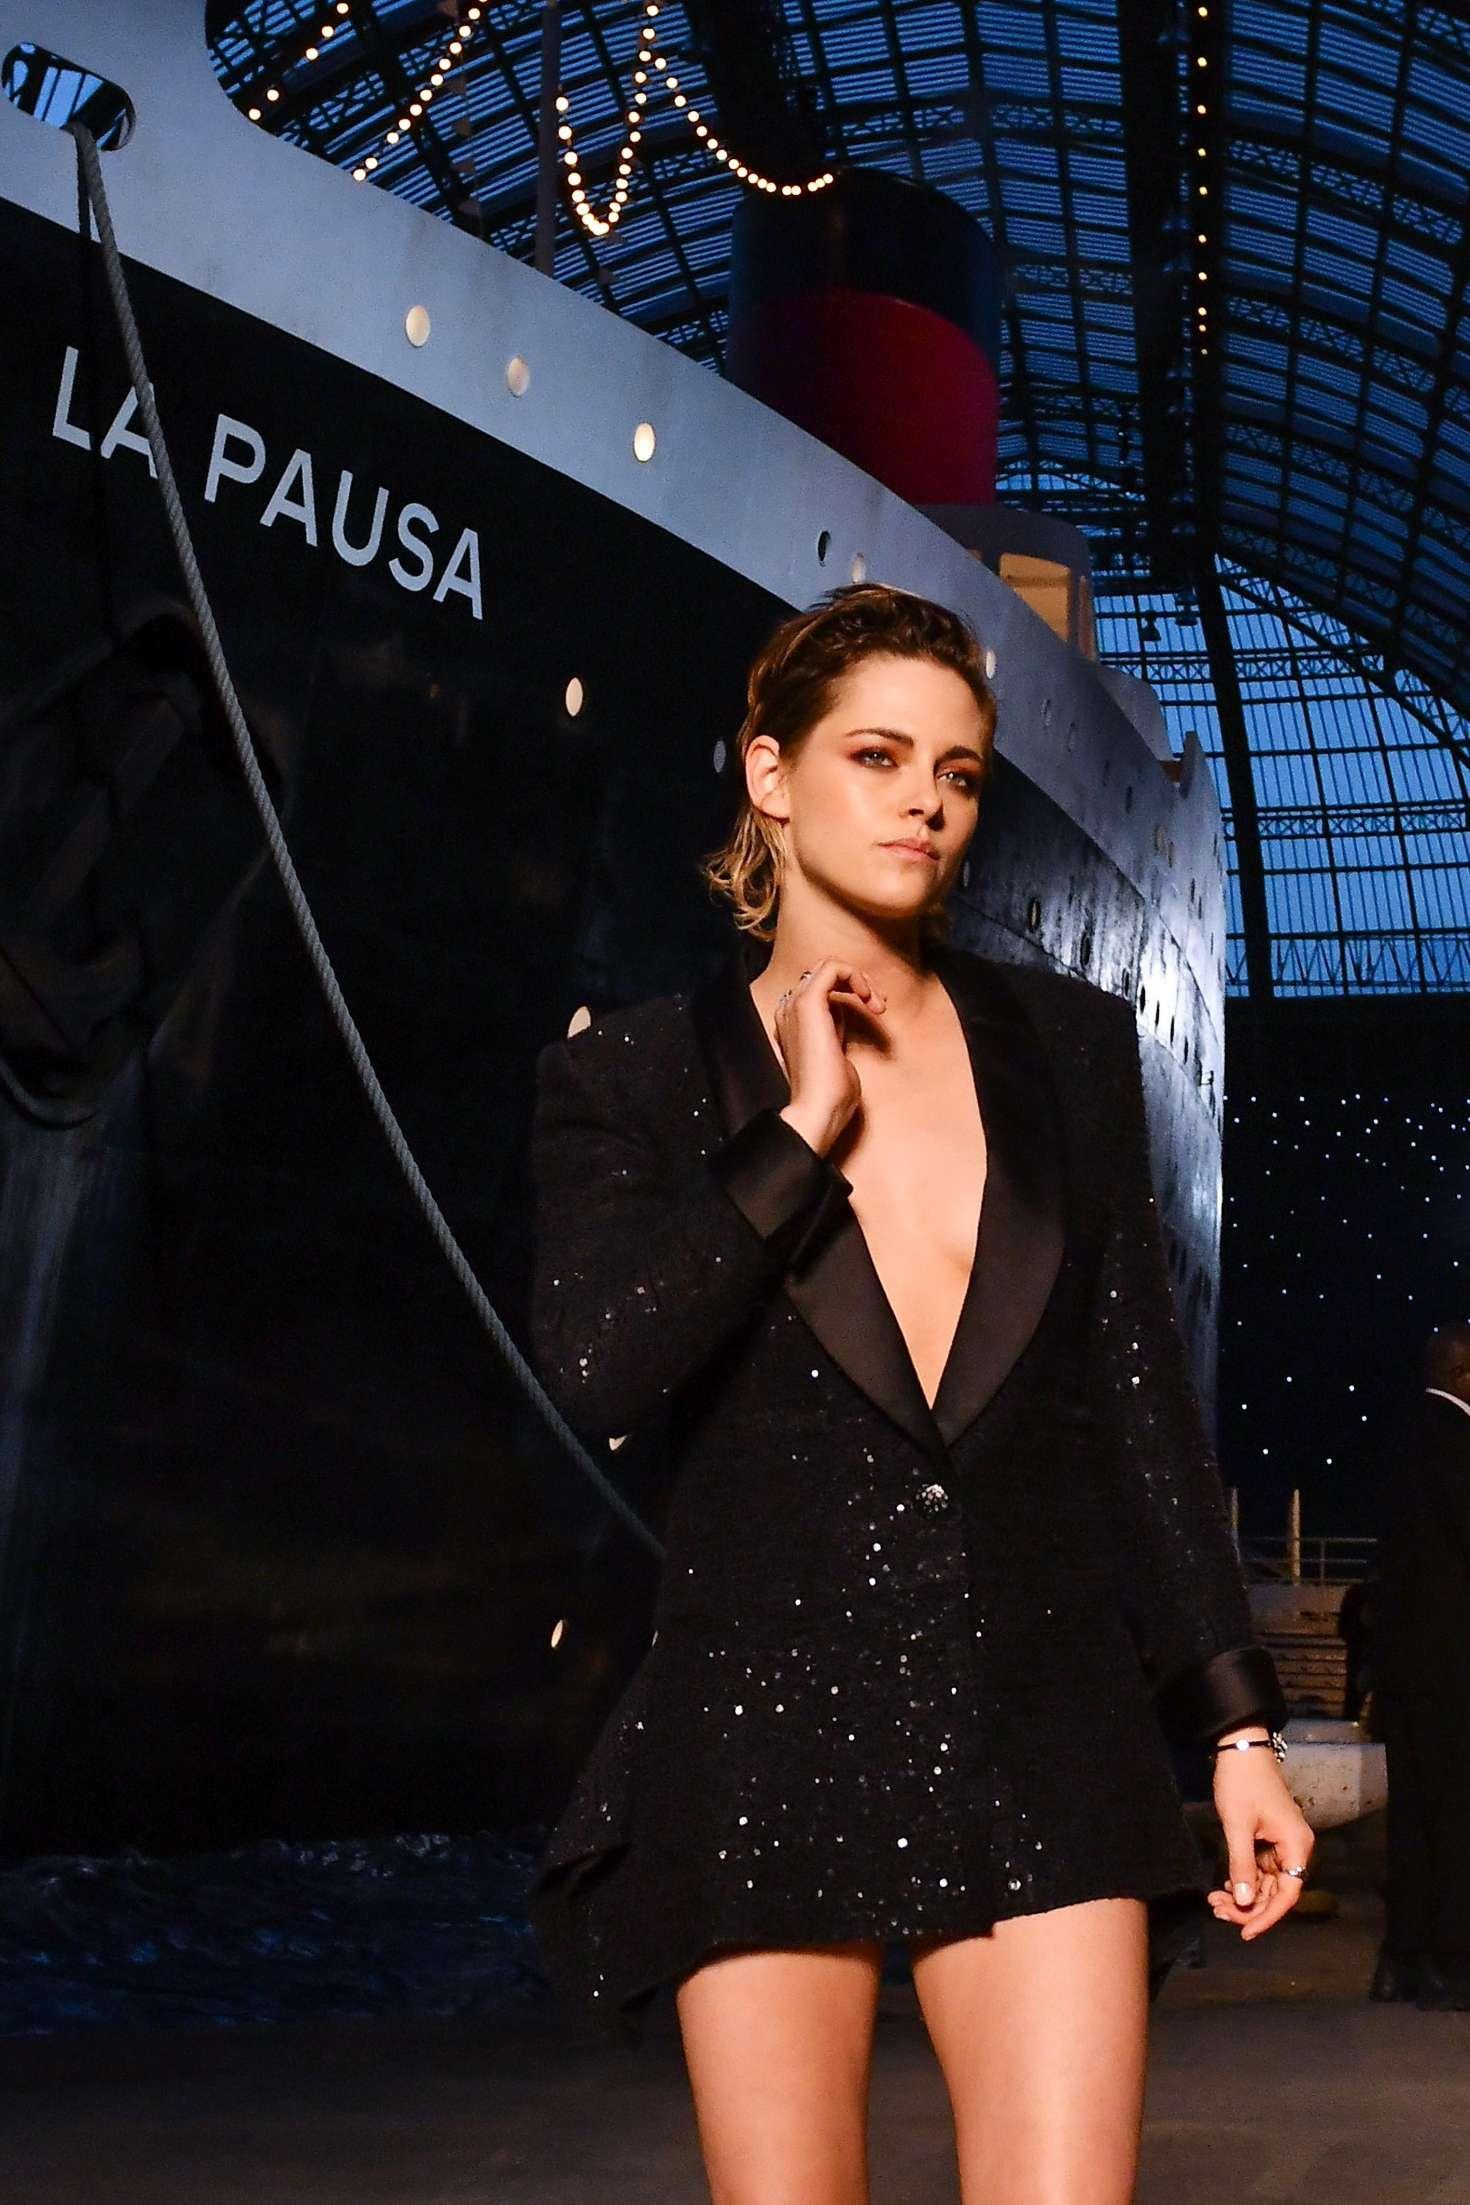 See Through Photos of Daisy Lowe. 2018-2019 celebrityes photos leaks!